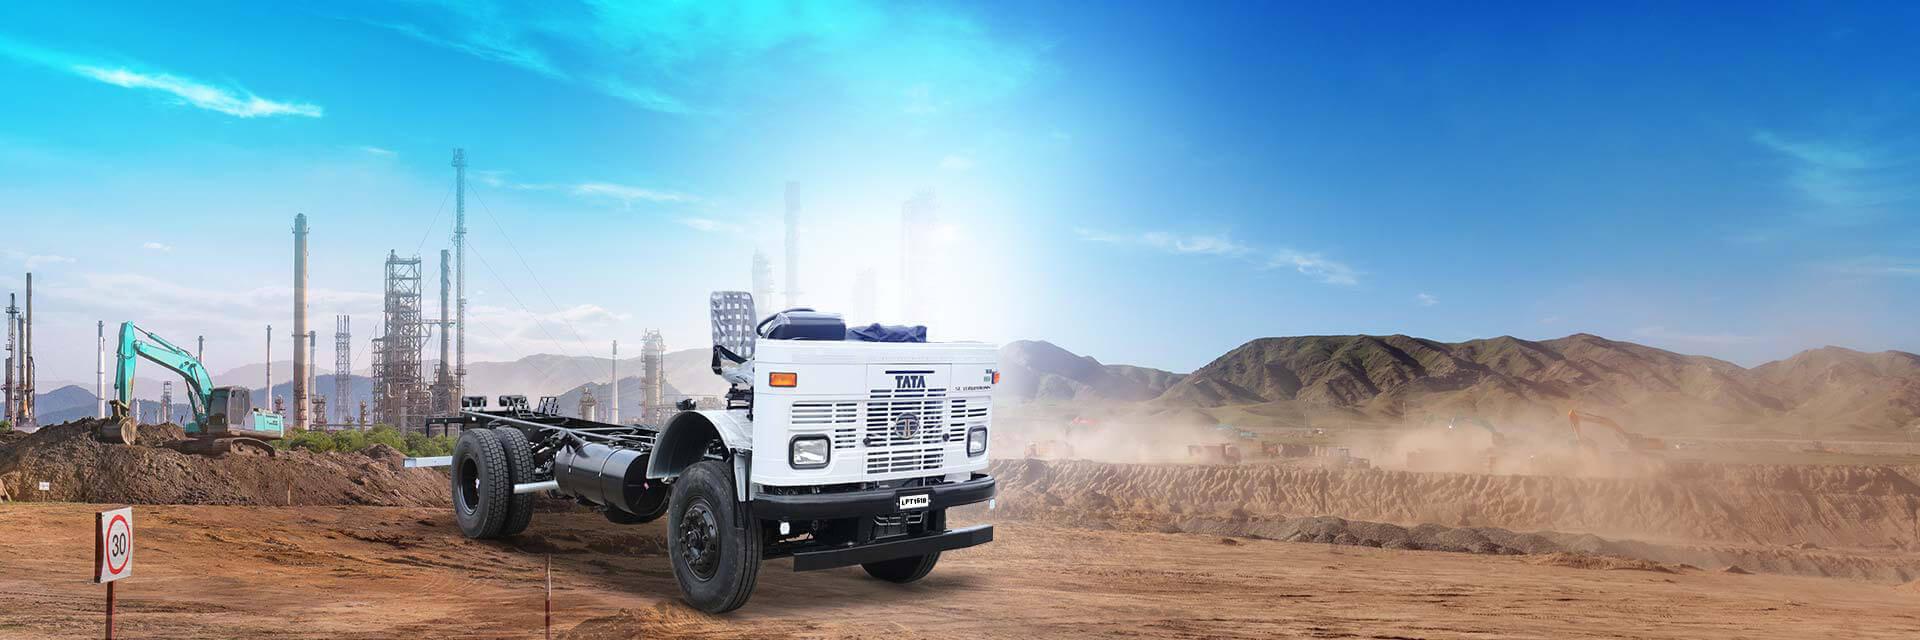 banner trucks lpt 1618 5l turbotronn